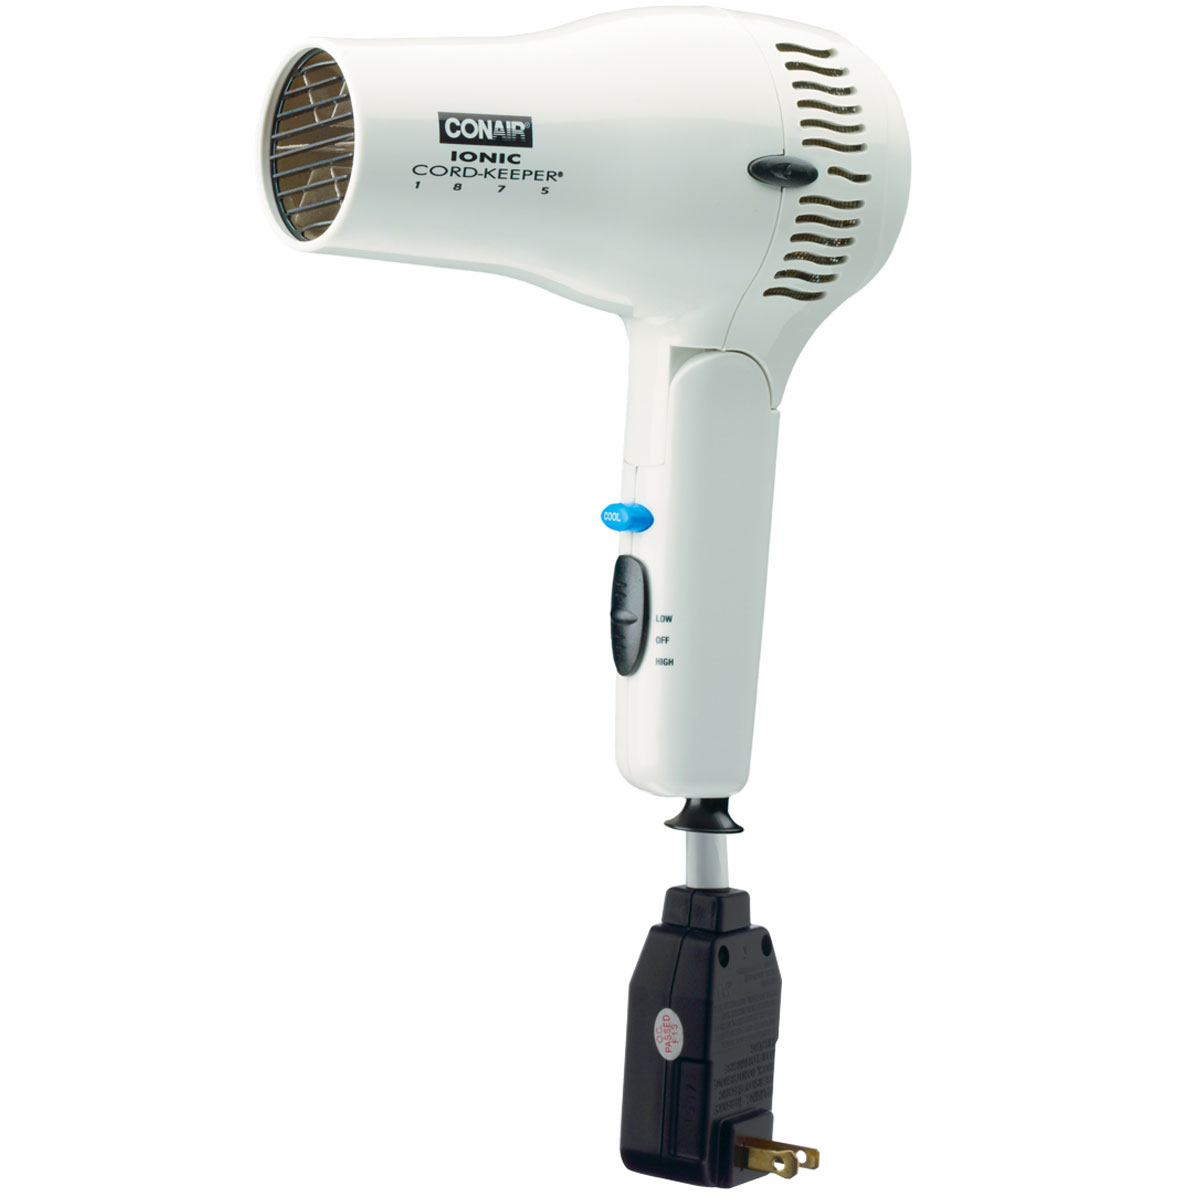 conair 169wiw 1875 watt ionic cord keeper dryer hair dryer w folding handle white 4 per case. Black Bedroom Furniture Sets. Home Design Ideas